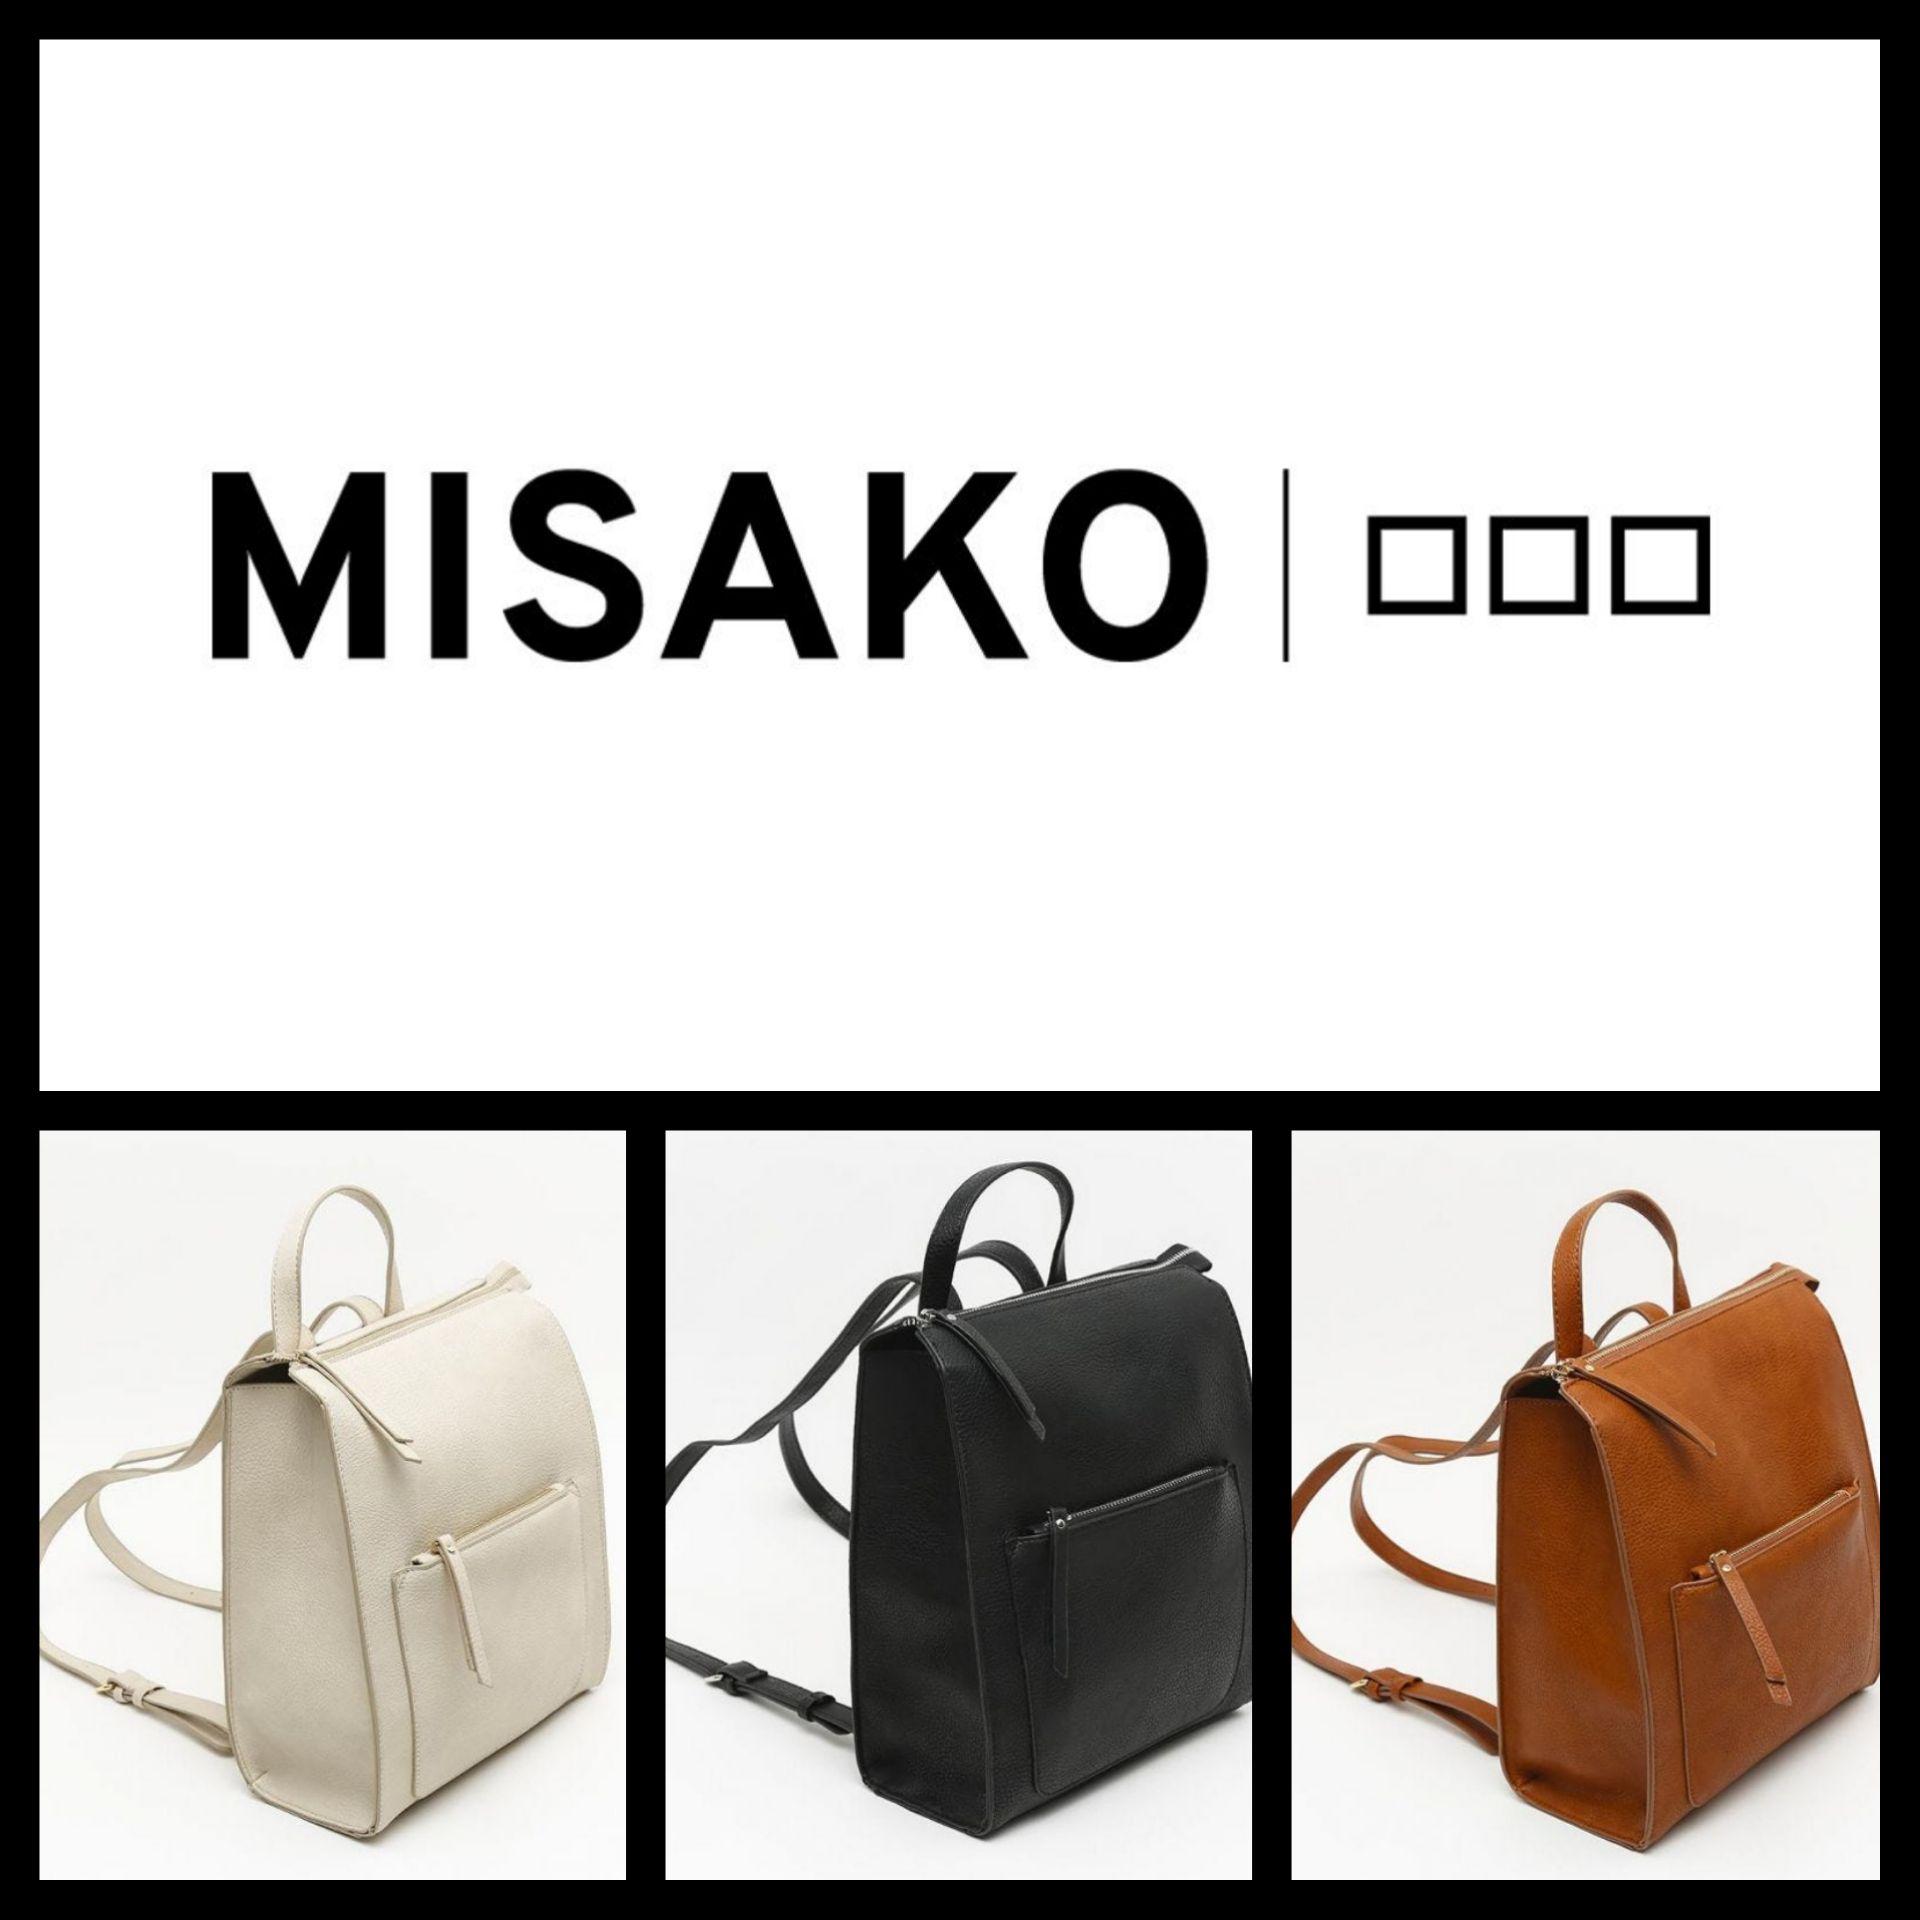 Mochila Misako por 7,80€ (3 Colores a elegir)